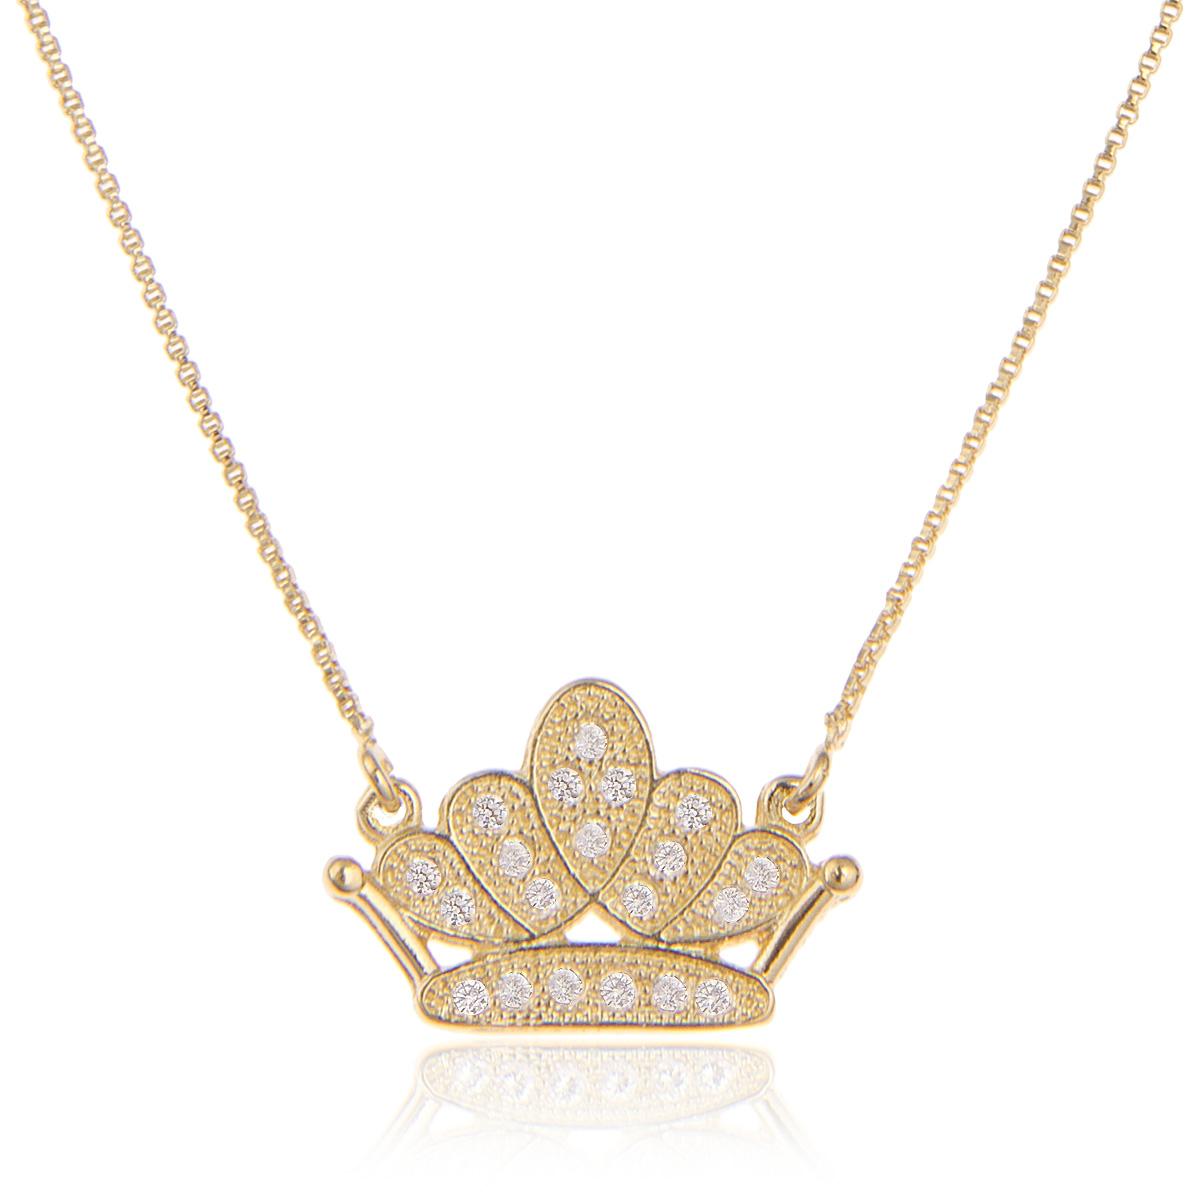 Colar Pingente Coroa Semijoia Ouro 18K com Zircônia Branca  - Soloyou